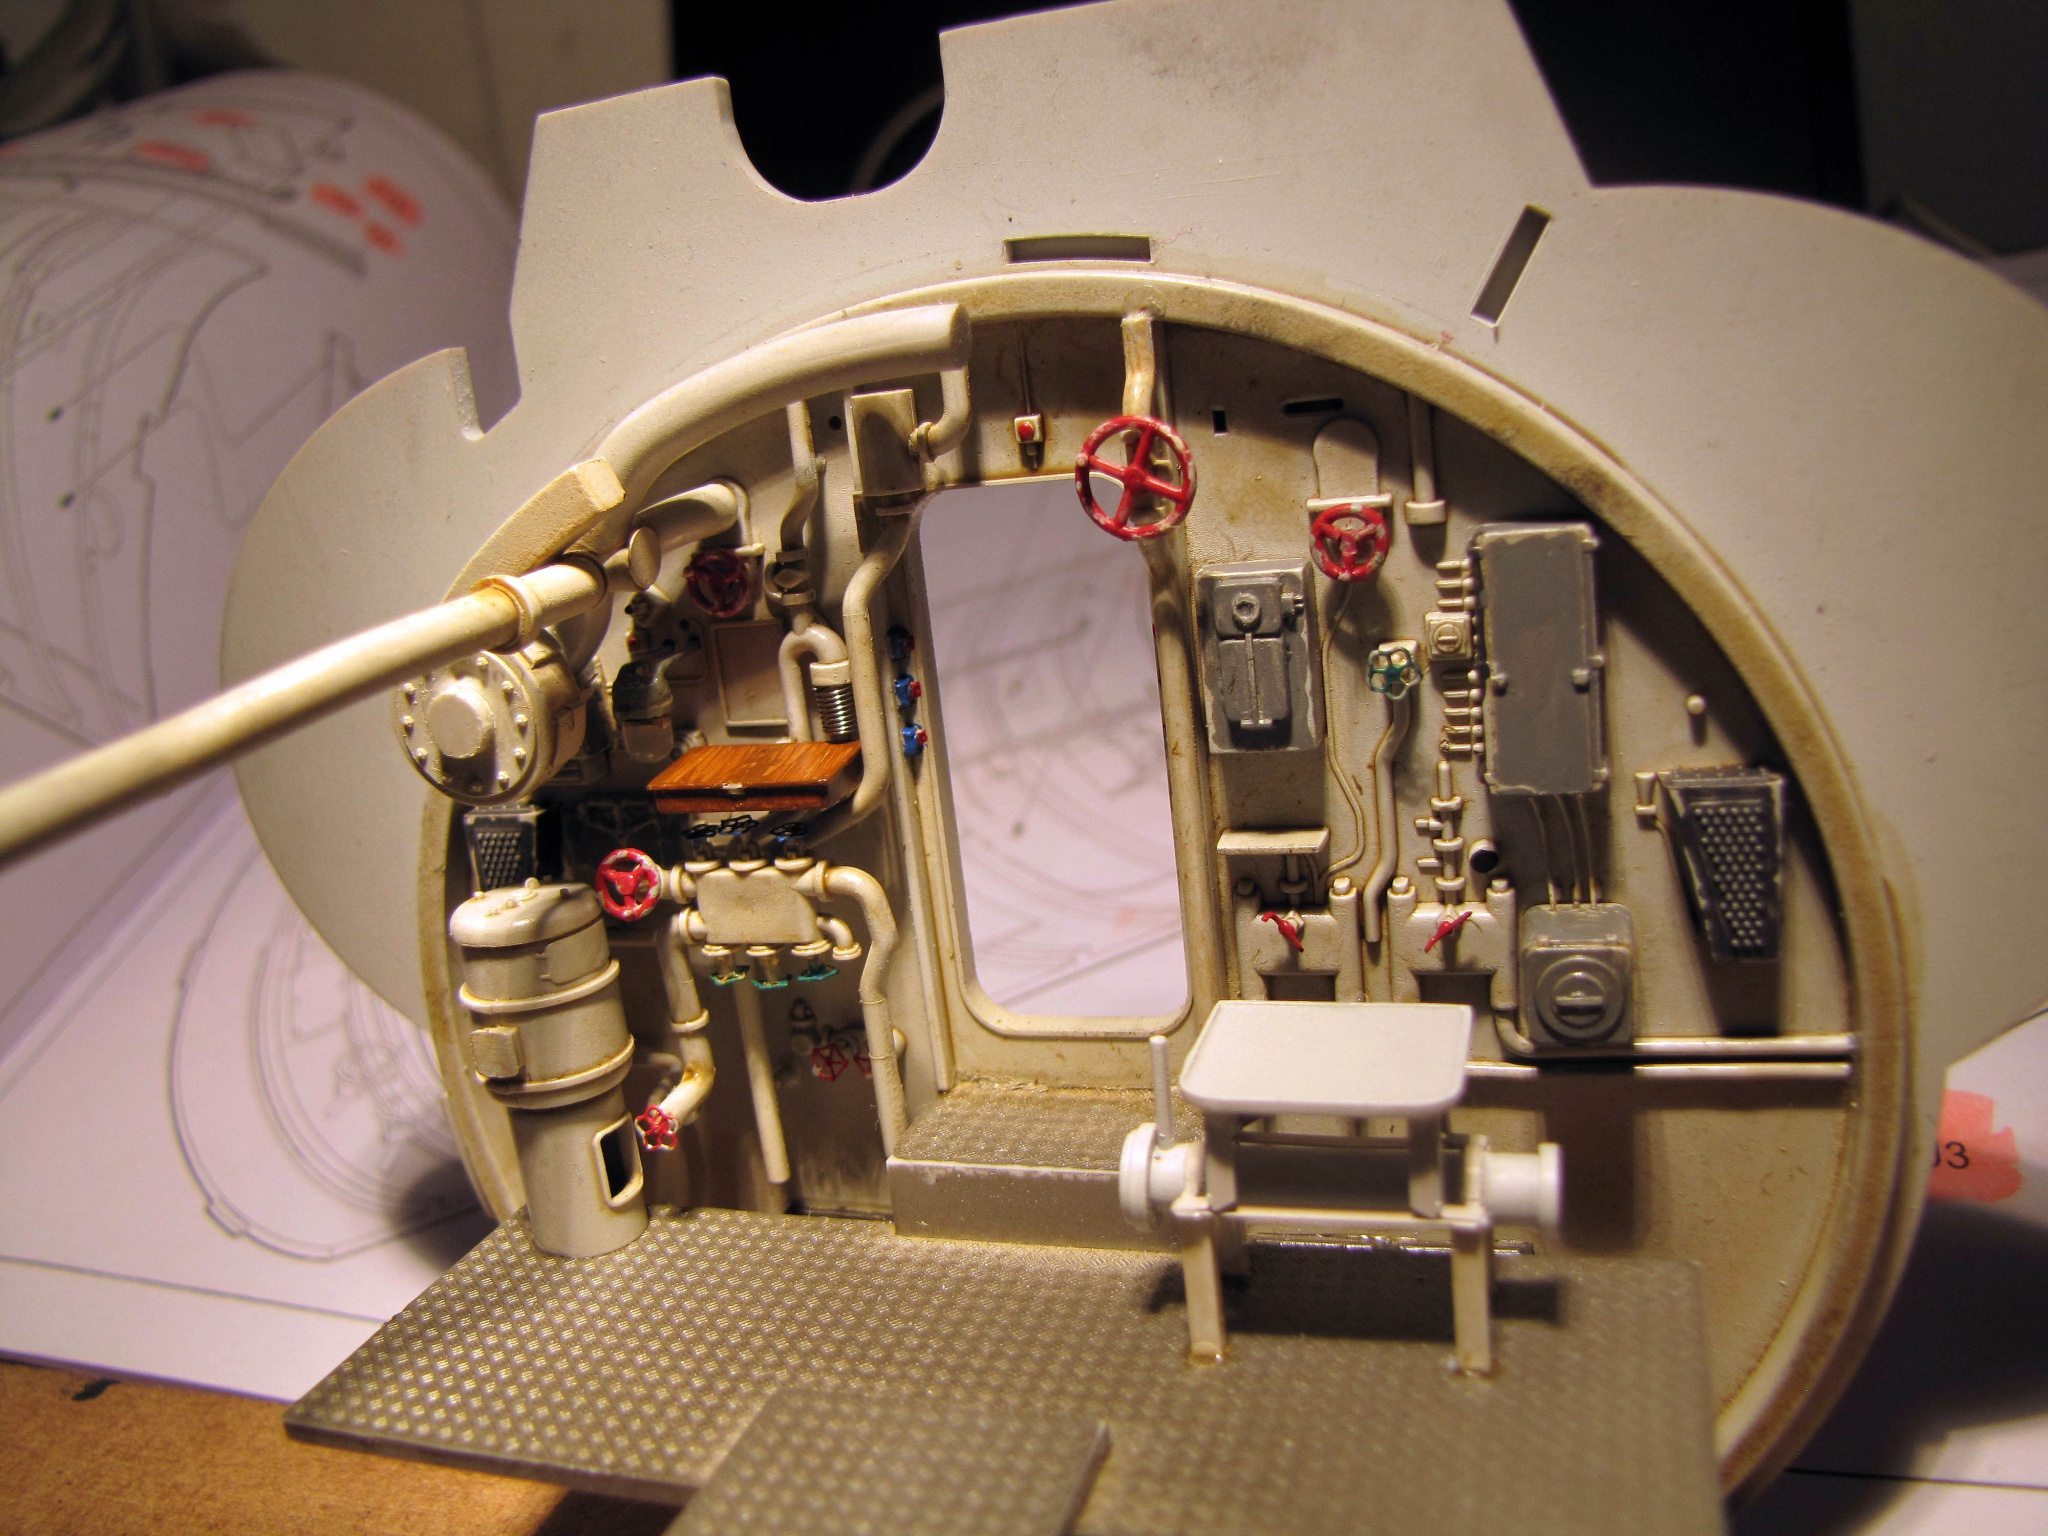 U-552 TRUMPETER Echelle 1/48 - Page 4 813965zzb